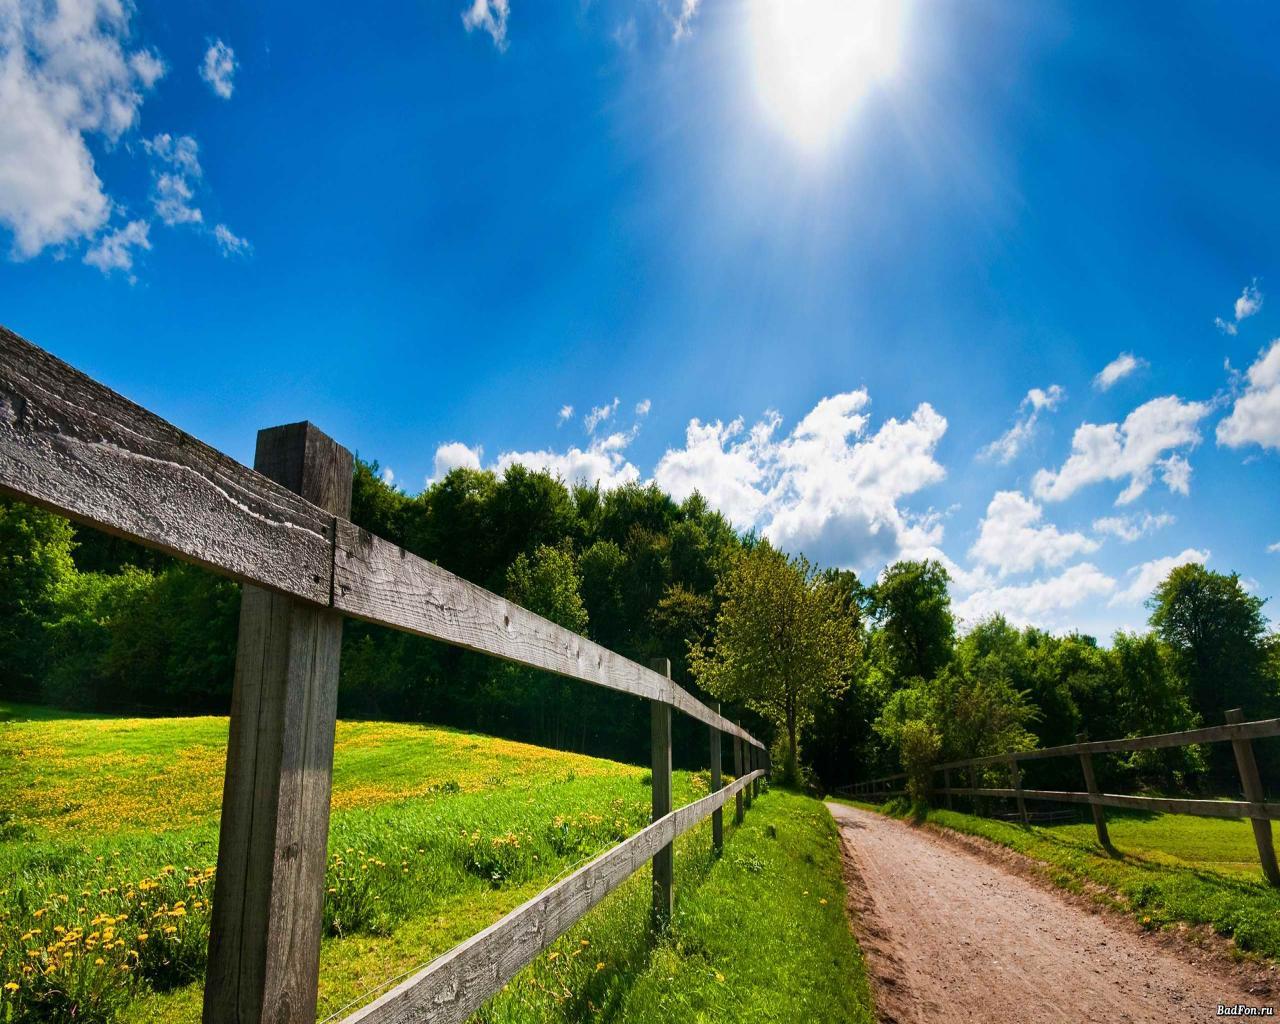 Beautiful Sunny Day Wallpaper   Picseriocom 1280x1024